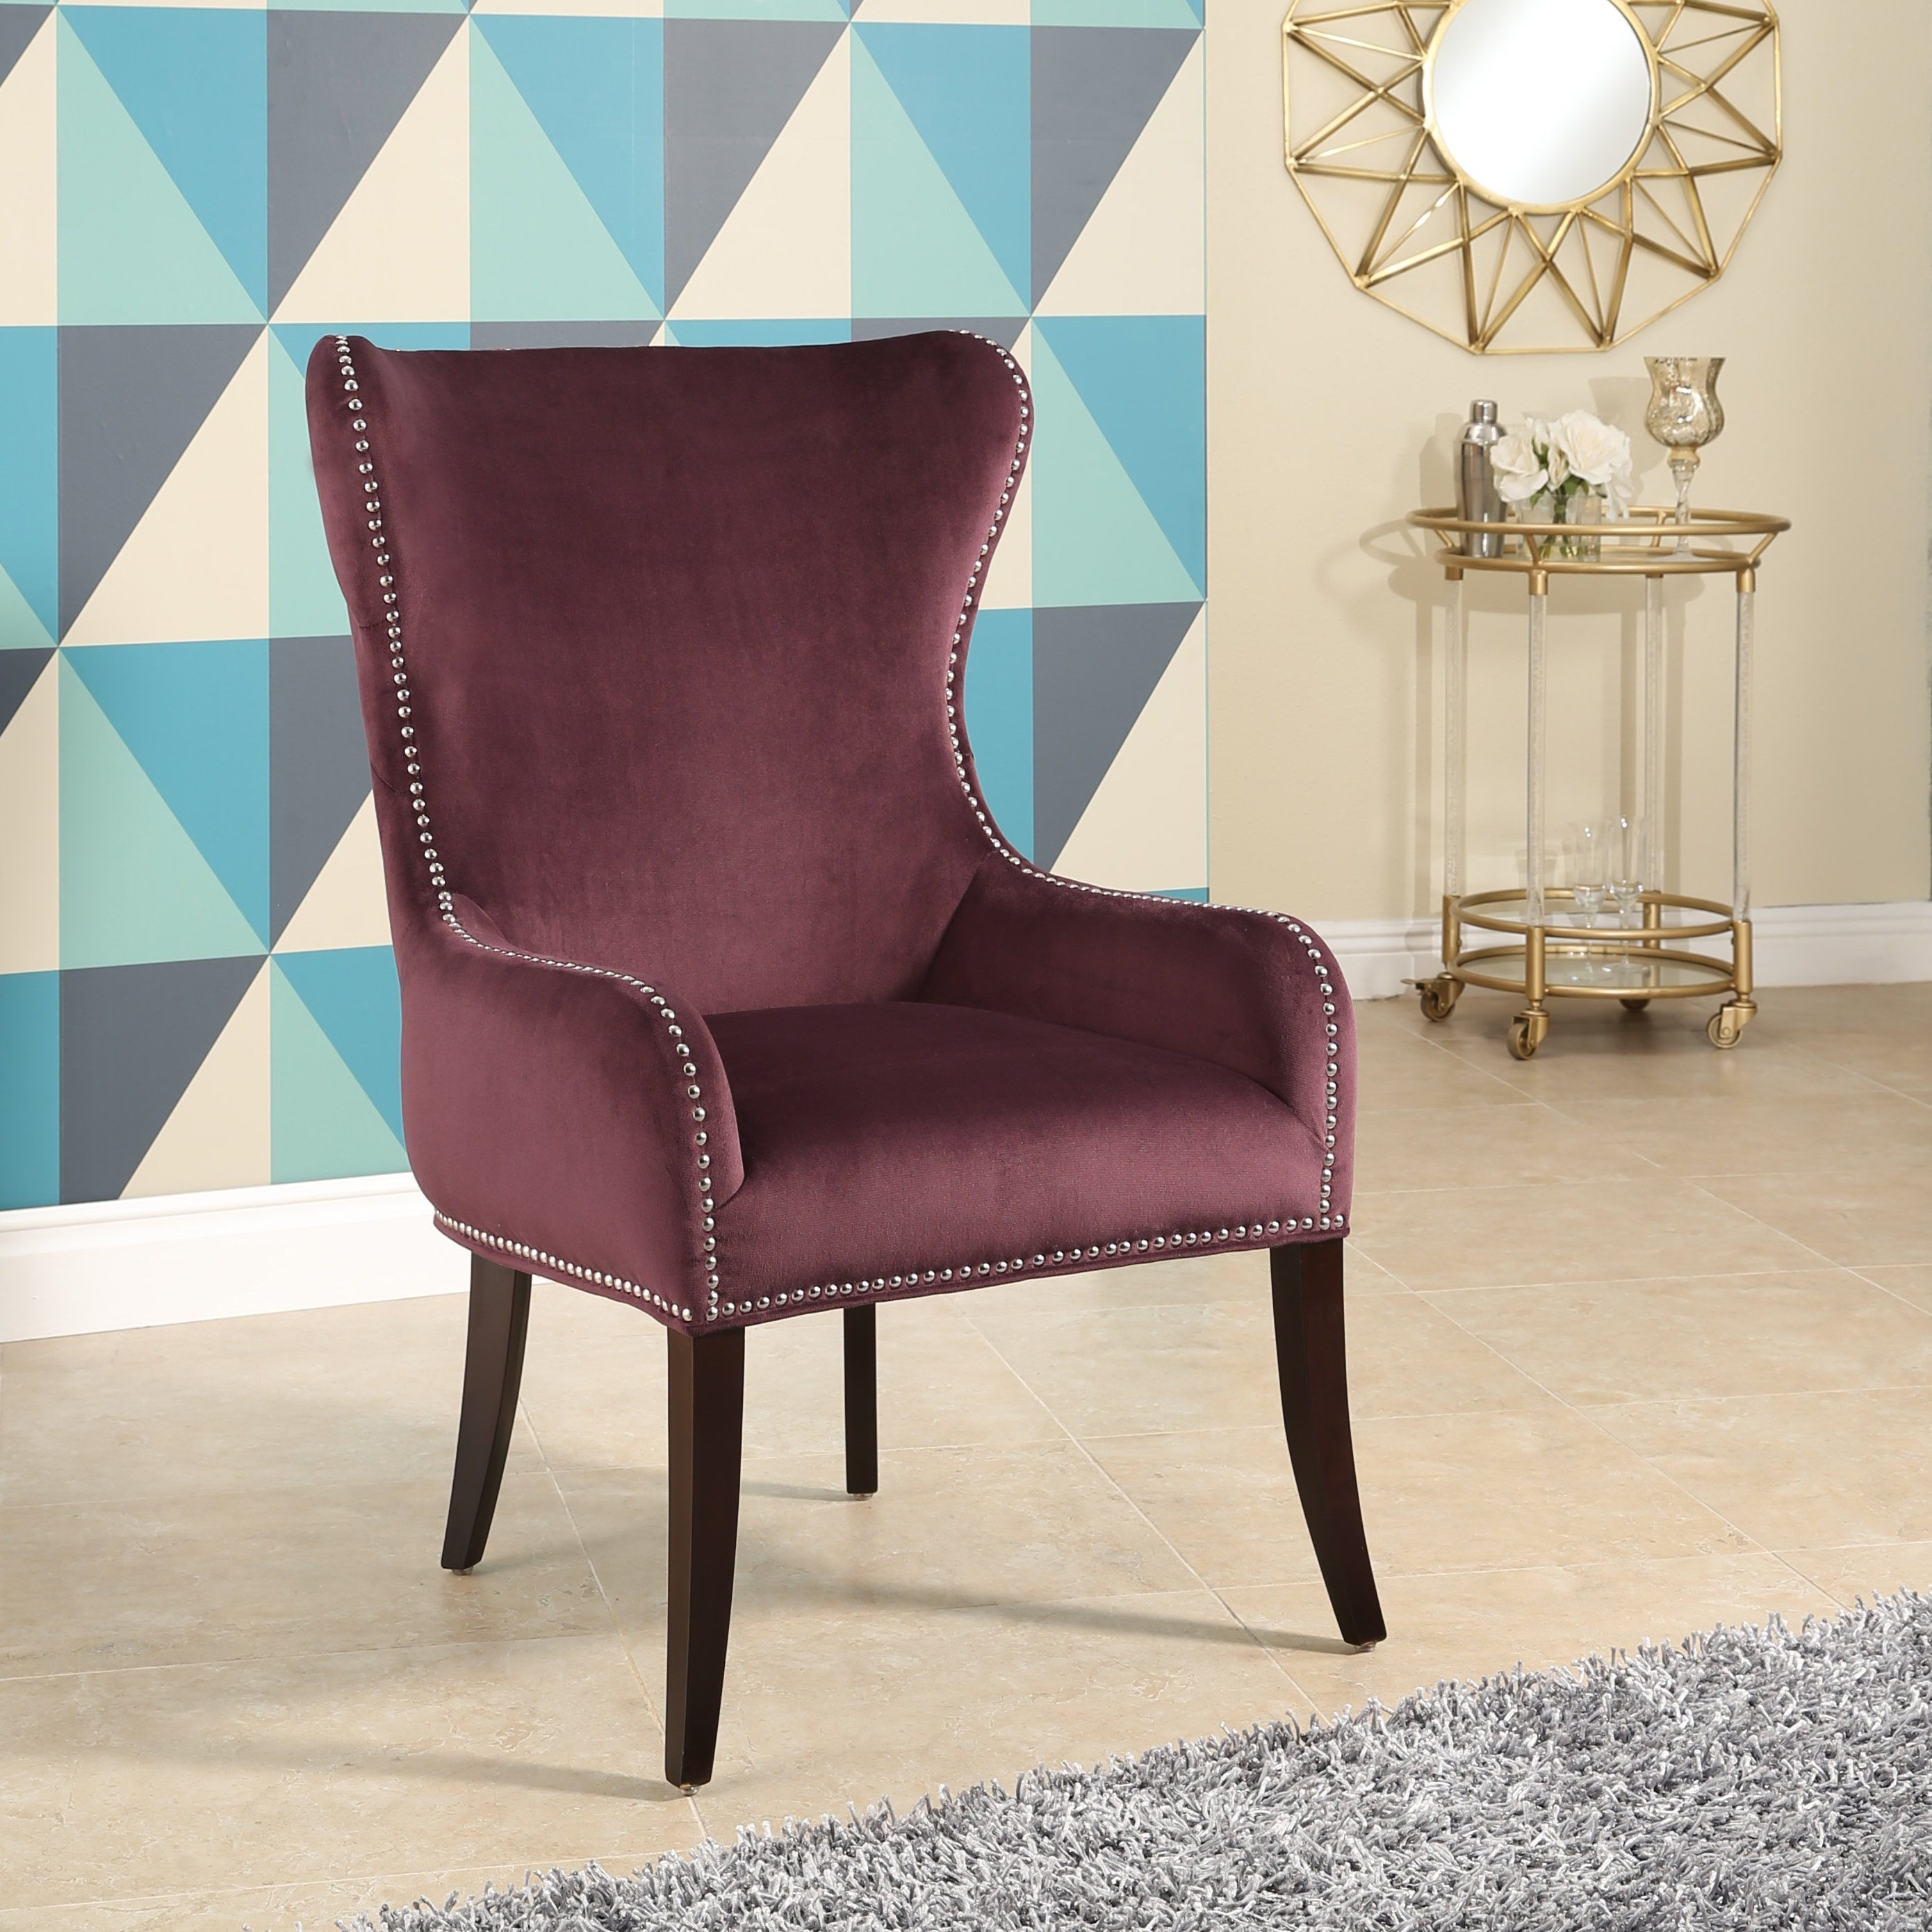 Abbyson Henri Tufted Purple Velvet Chair (Purple)(Fabric